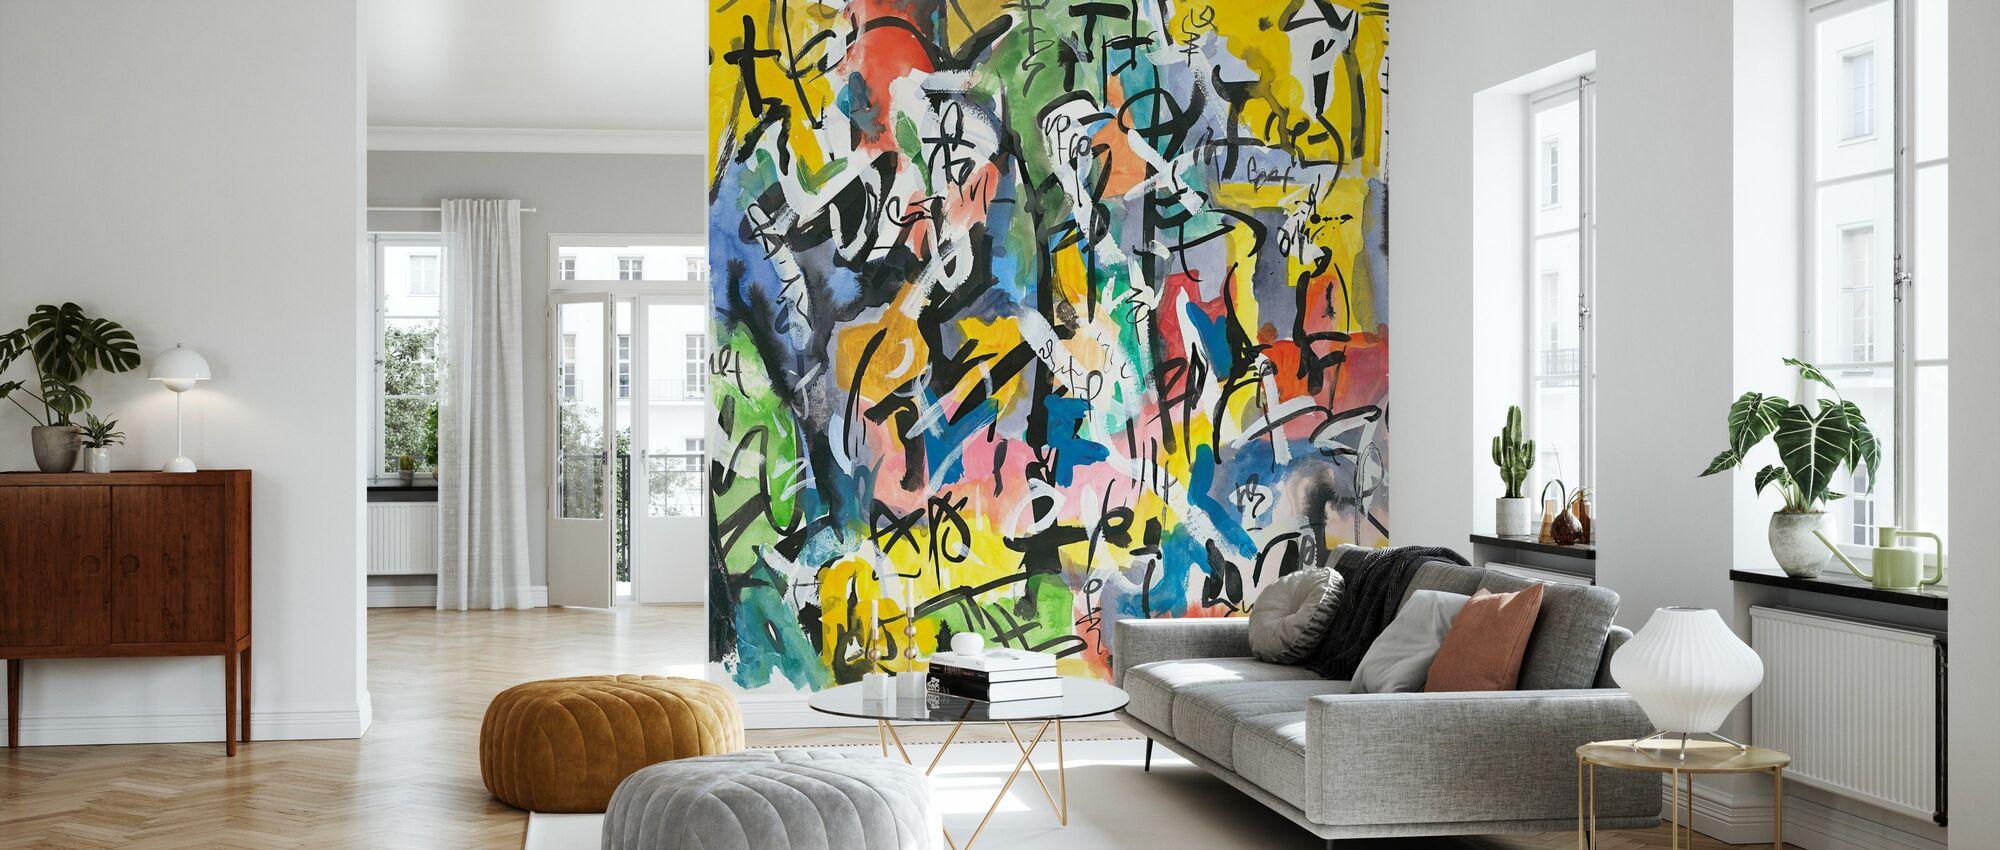 Calligraphic - Wallpaper - Living Room